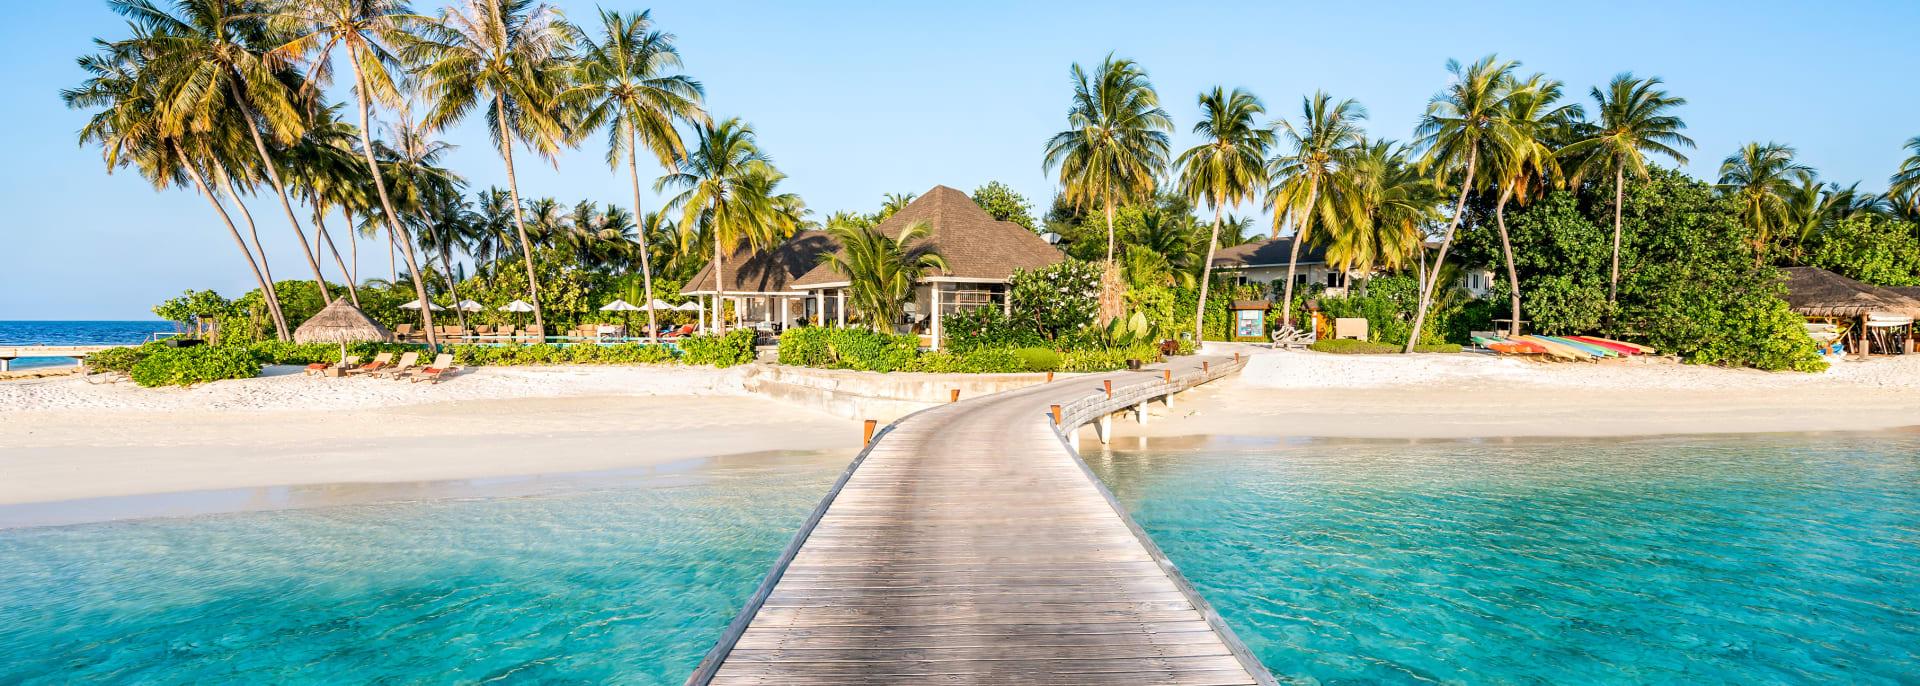 Sonnenstrand, Malediven